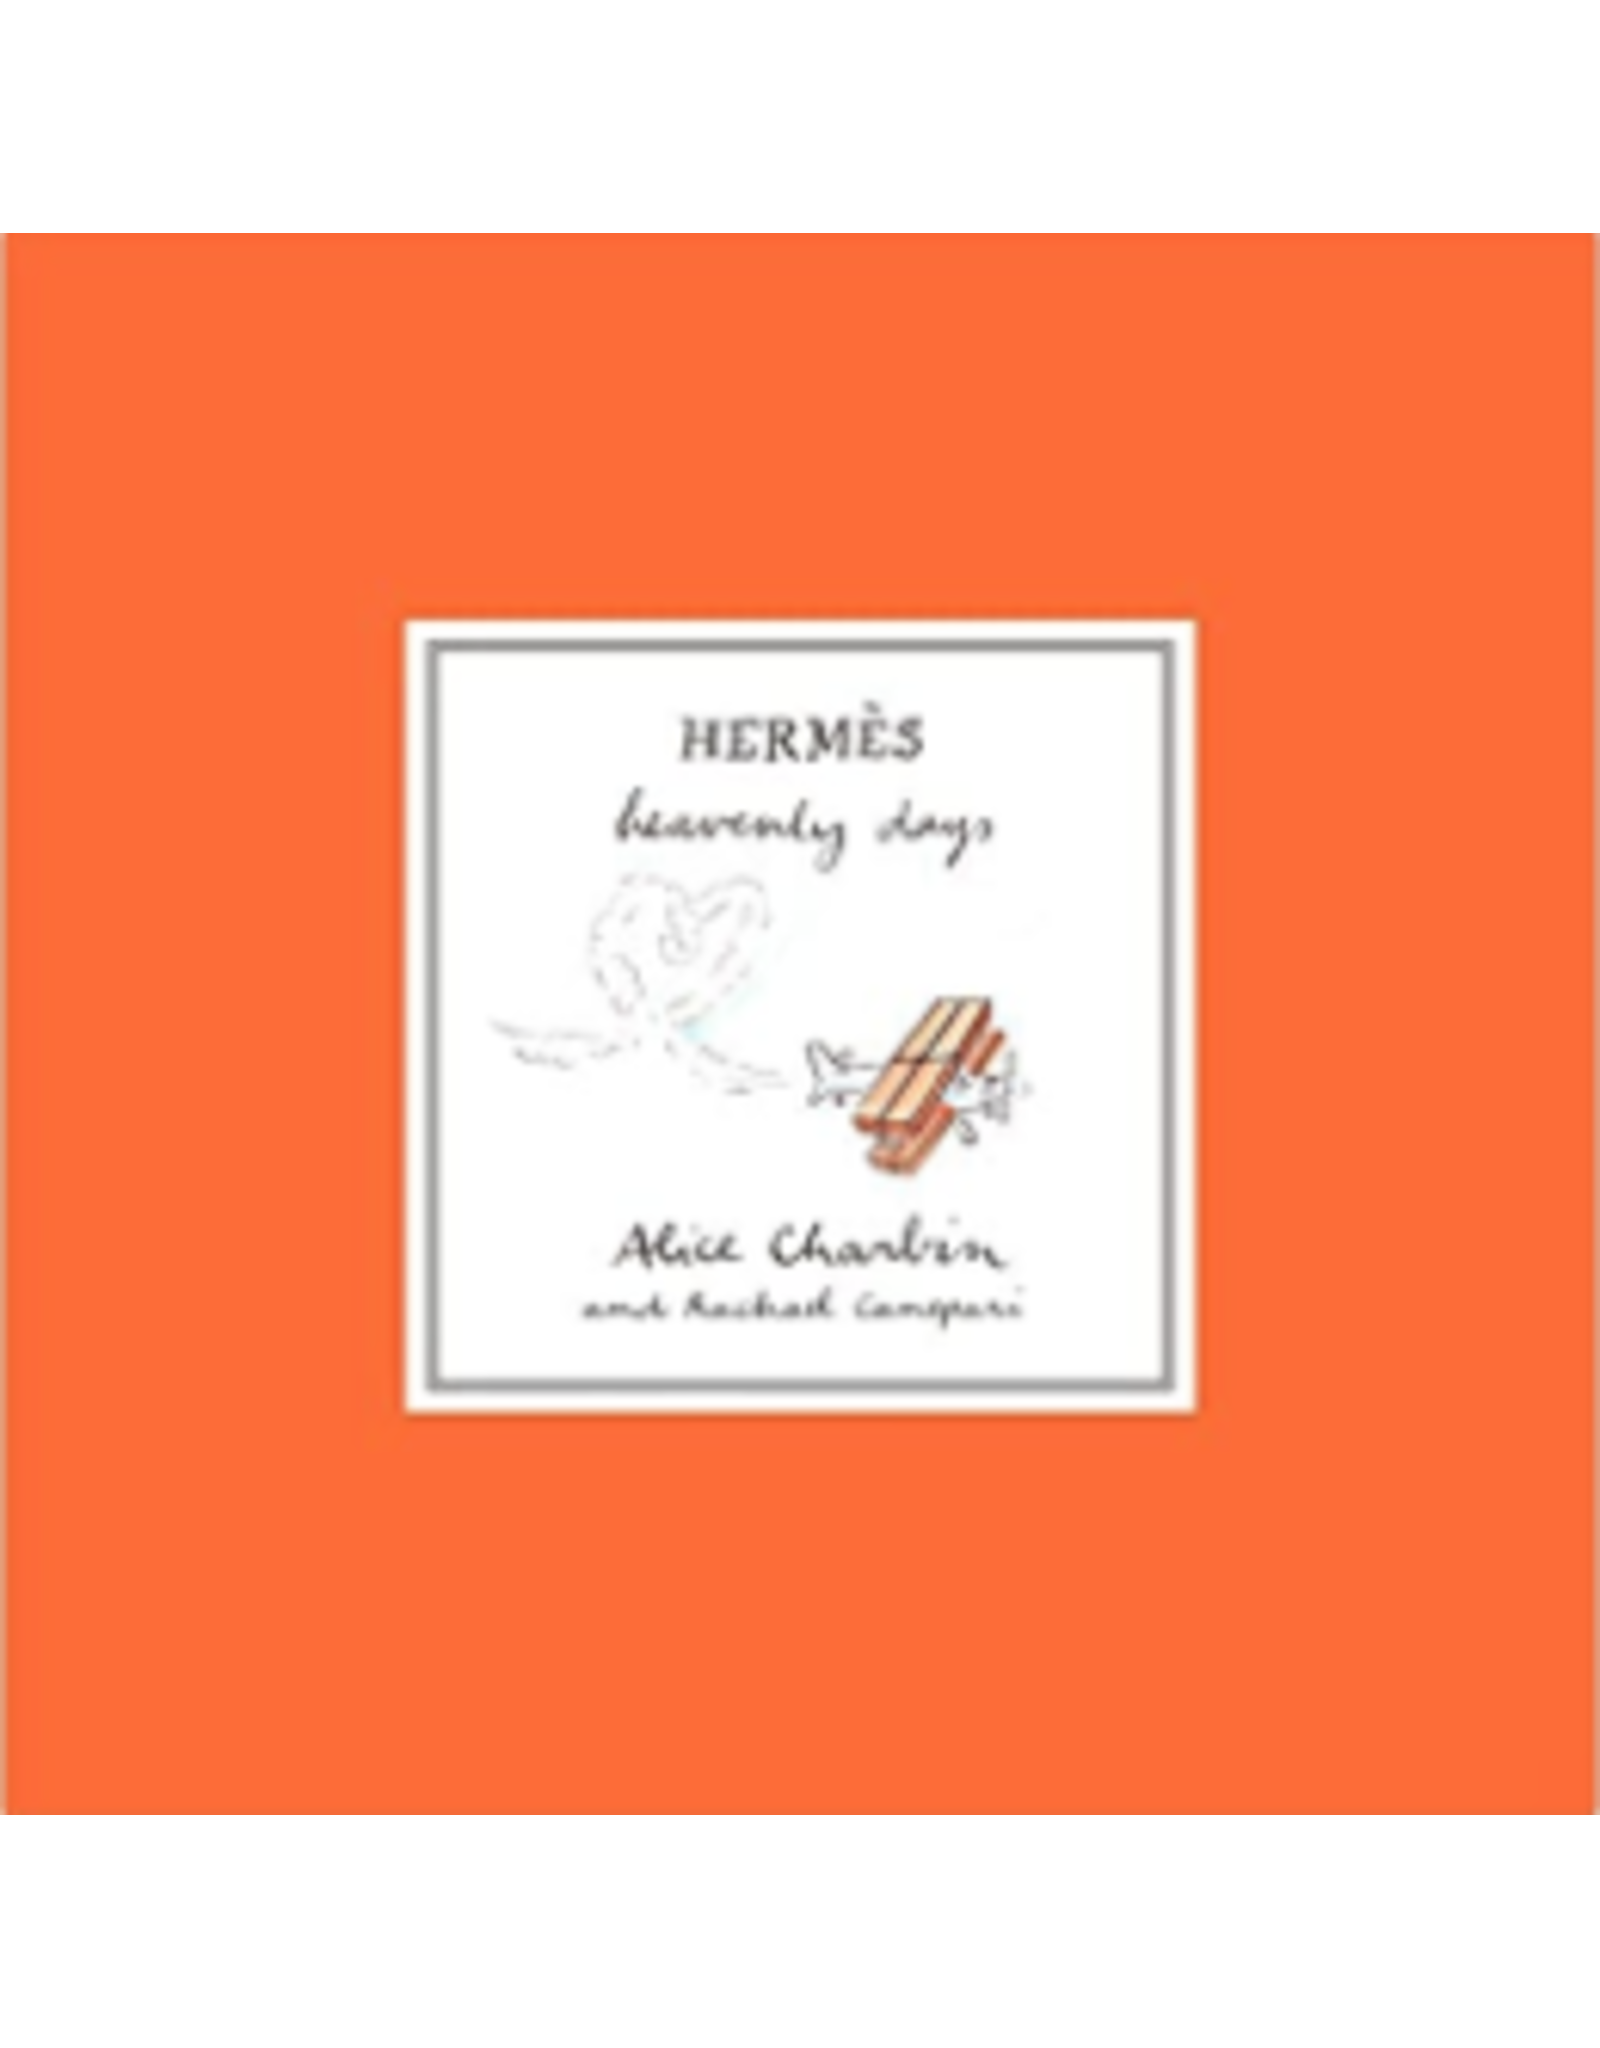 Website Hermes: Heavenly Days